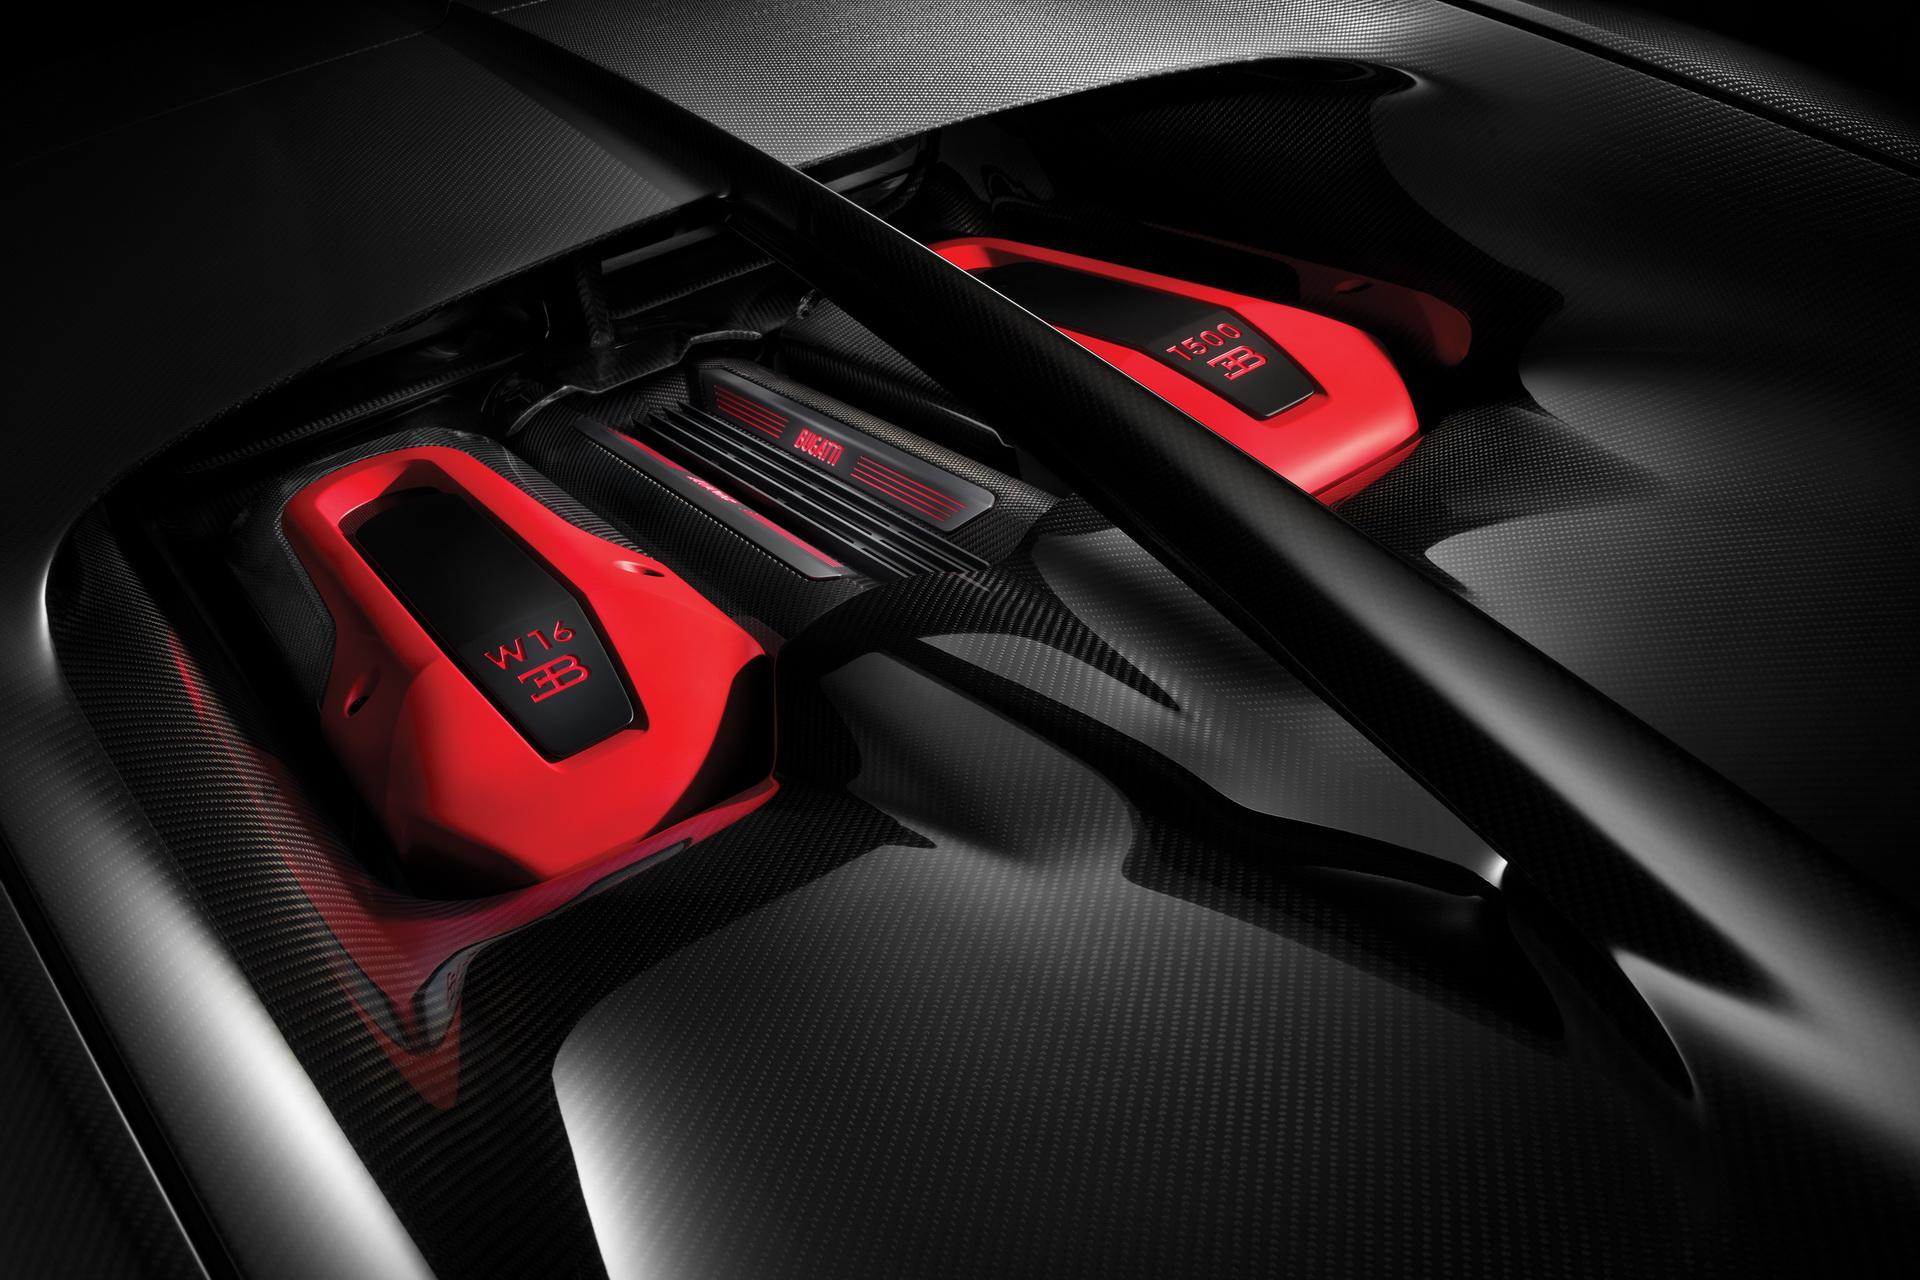 Conduzir um Chiron Sport está ao alcance de poucos condutores. Já ter no pulso um Bugatti Type 390 Sport faz corar donos de modelos da Ferrari, Aston Martin, Lamborghini e Bentley.